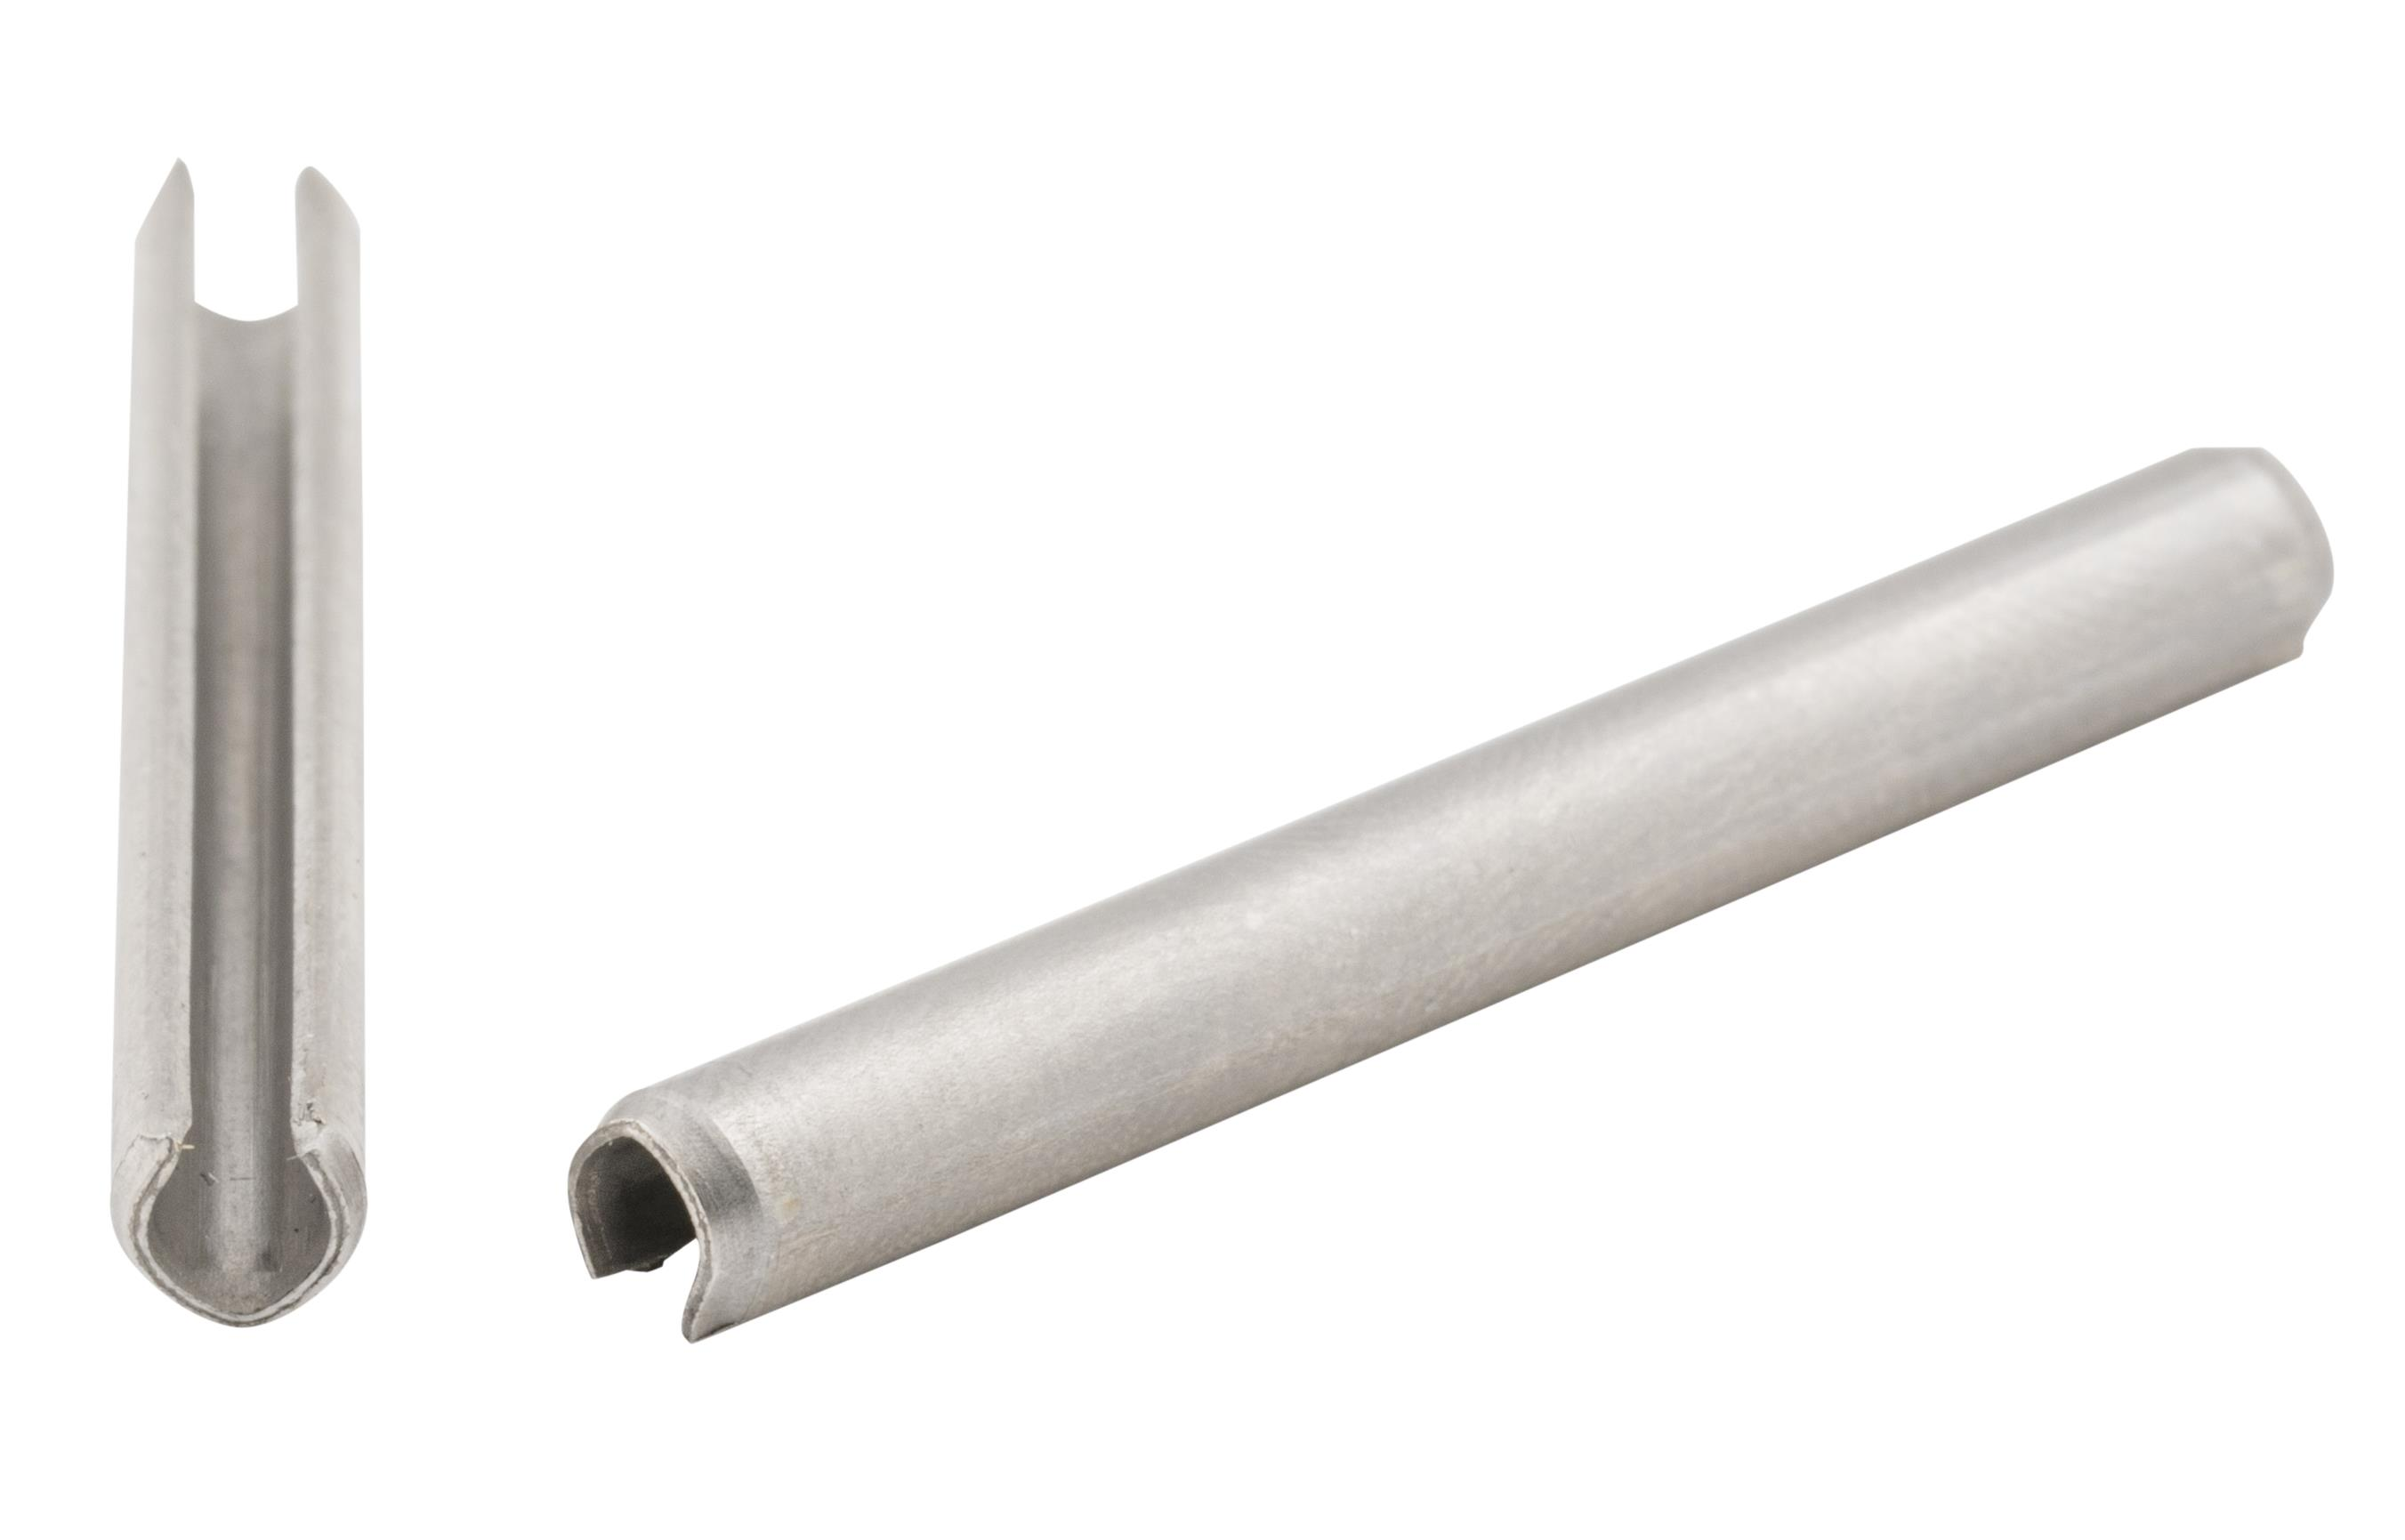 SPIROL ISO87526X16A2 Rörpinne 26 mm 1000-pack A2 ISO 8752 26 x 16 mm